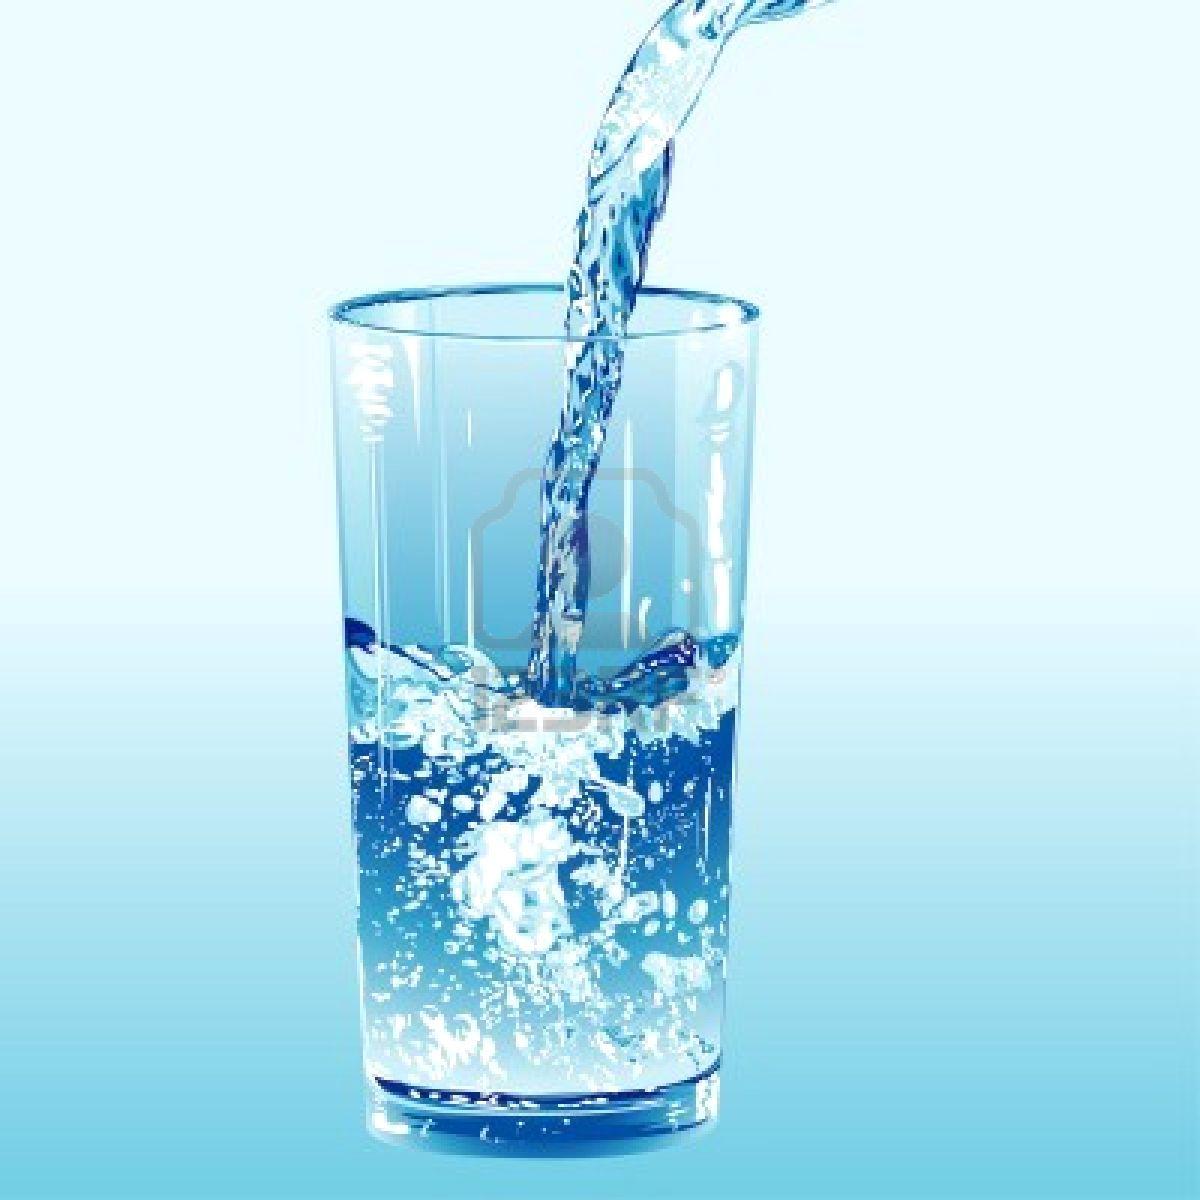 Vasos con agua imagenes auto design tech - Vaso con agua ...